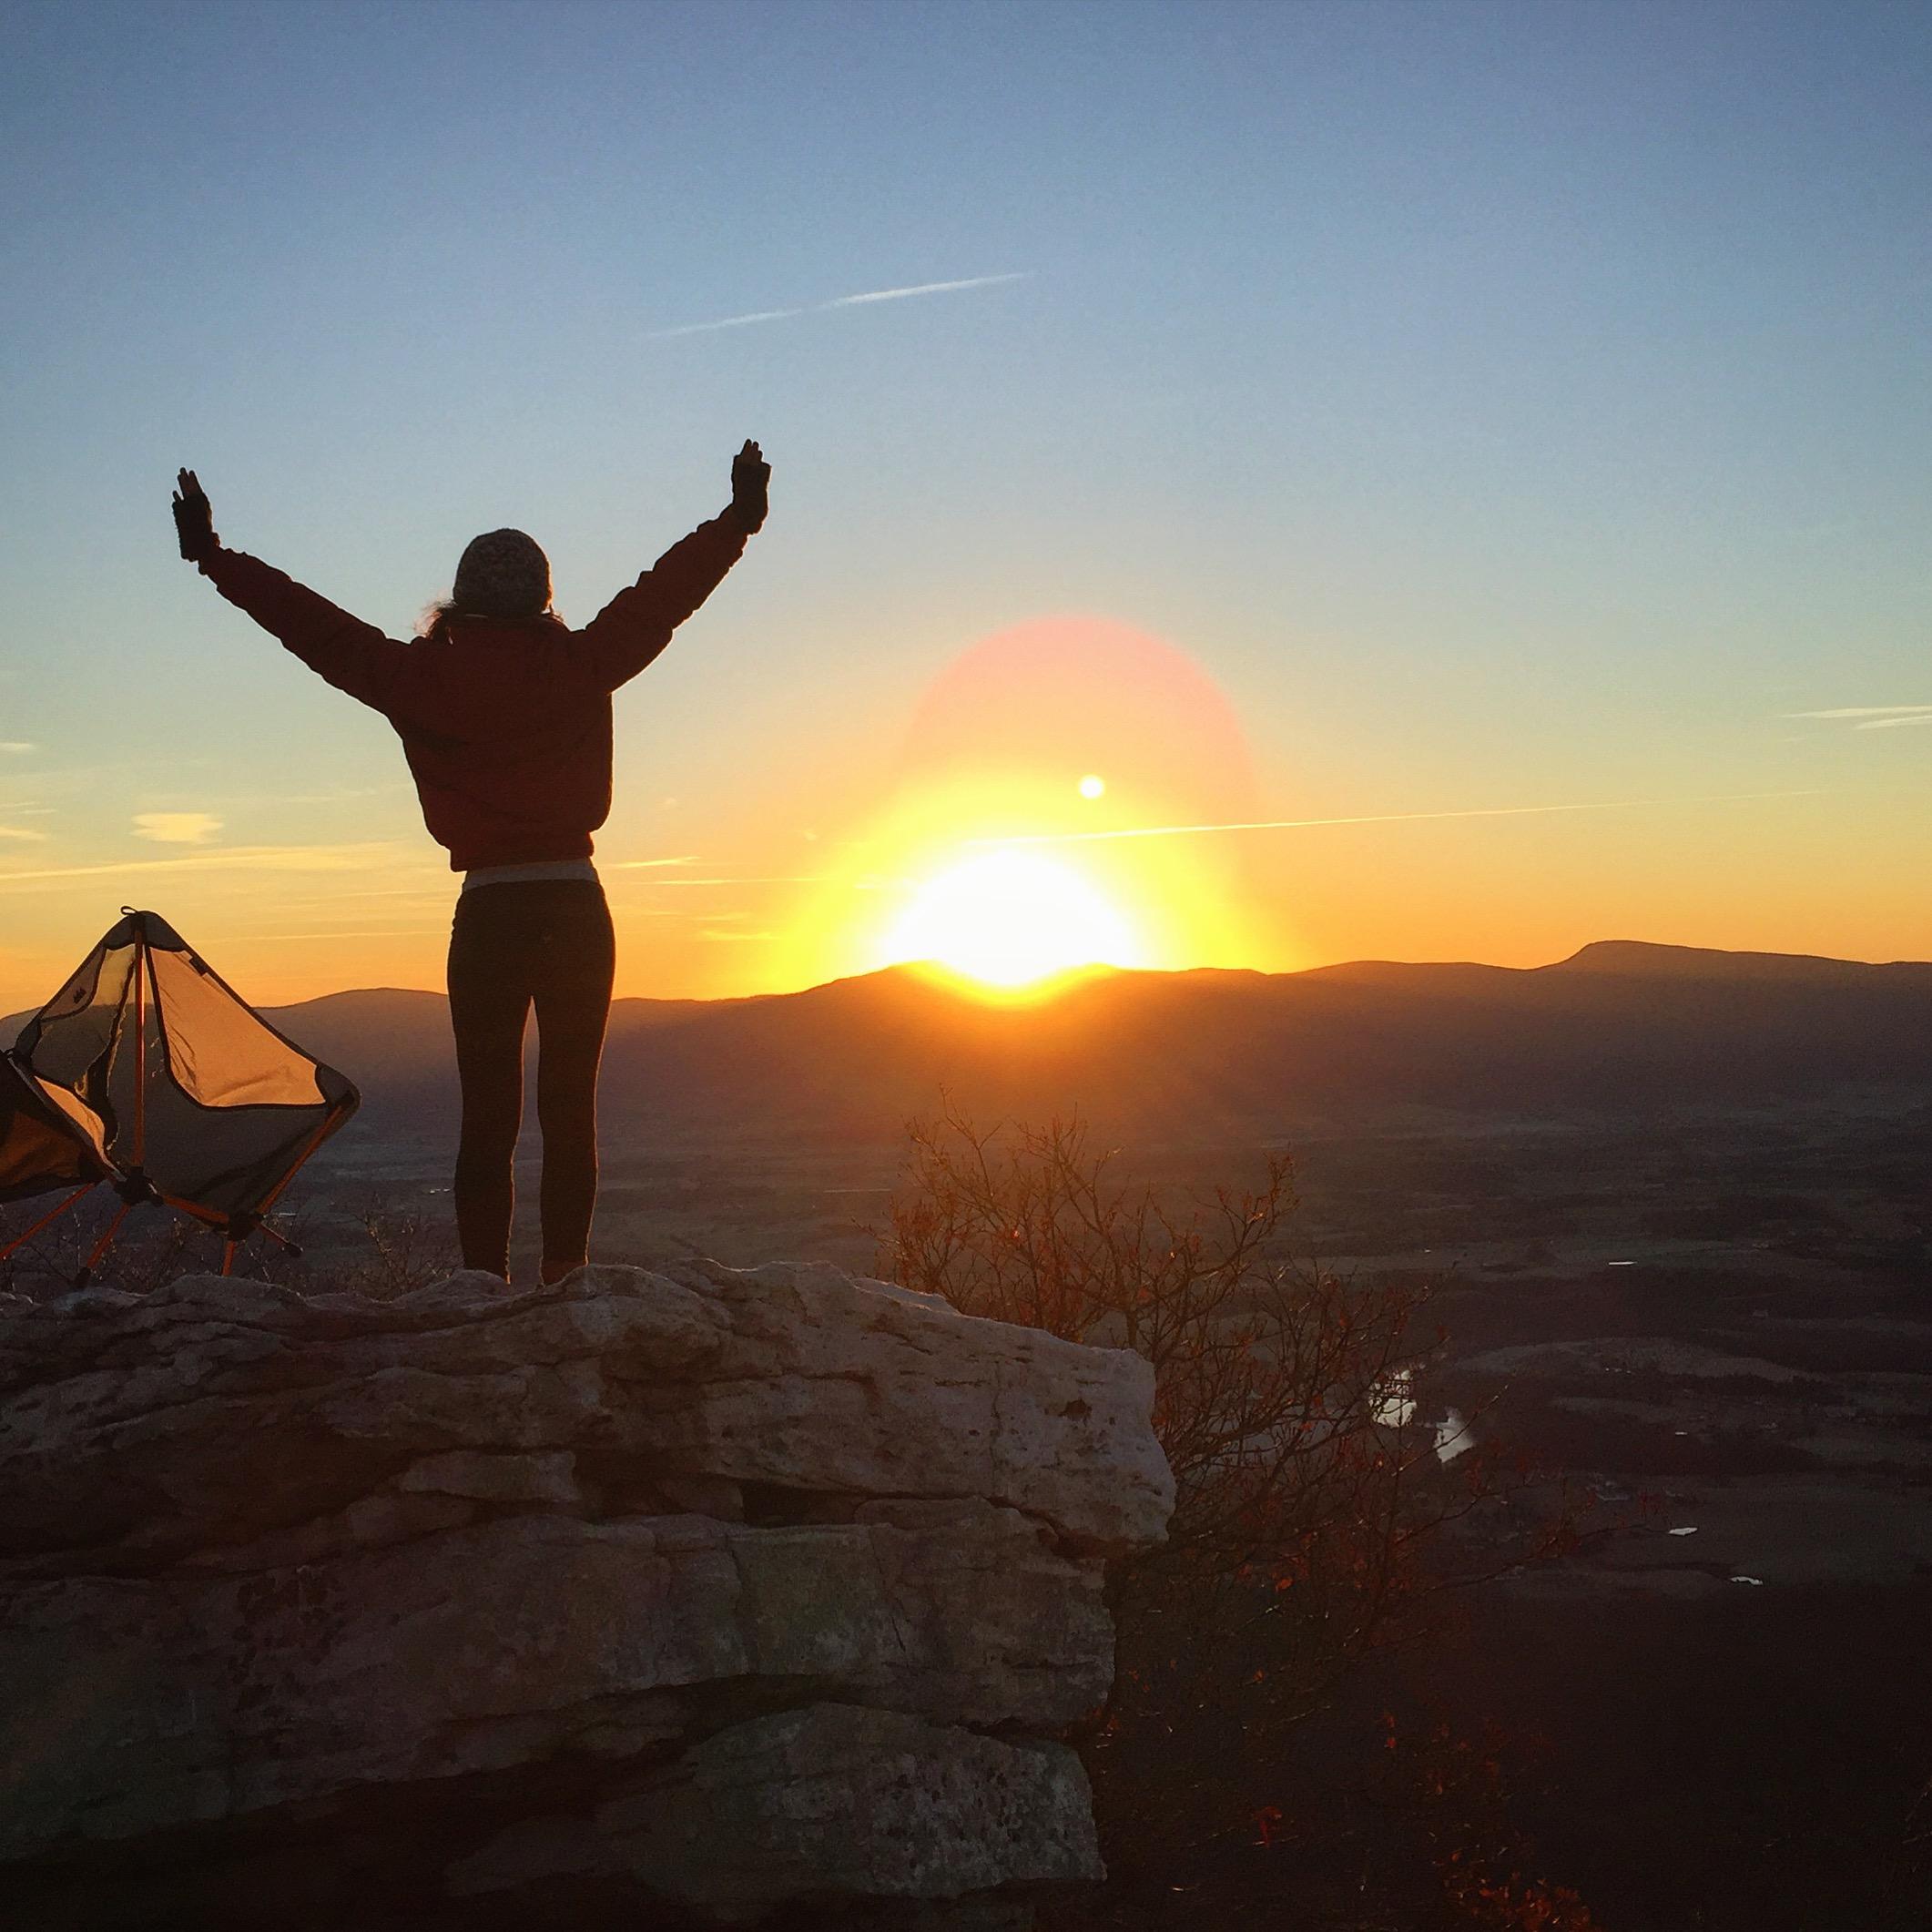 Saying hi to the best sunrise in Virginia in Strickler Knob